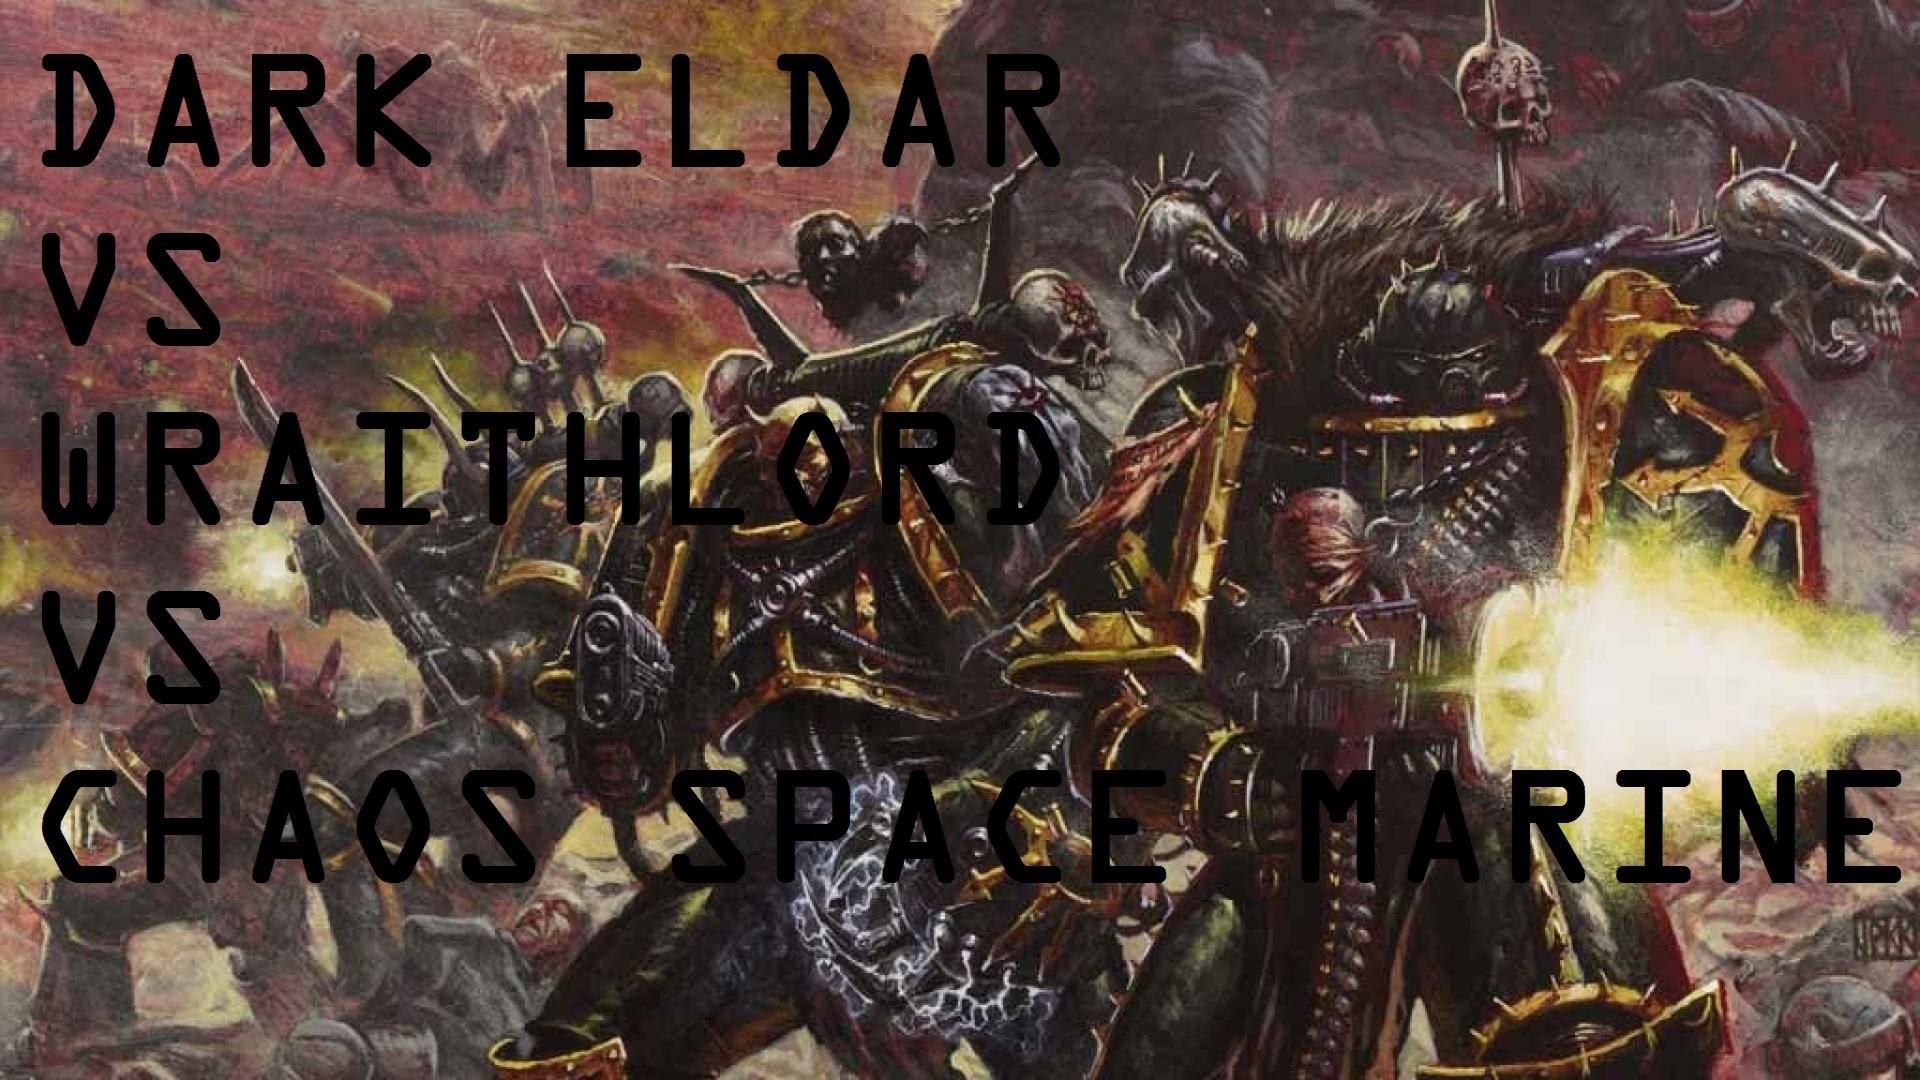 WH40K – DARK ELDAR VS WRAITHLORD VS CHAOS SPACE MARINE